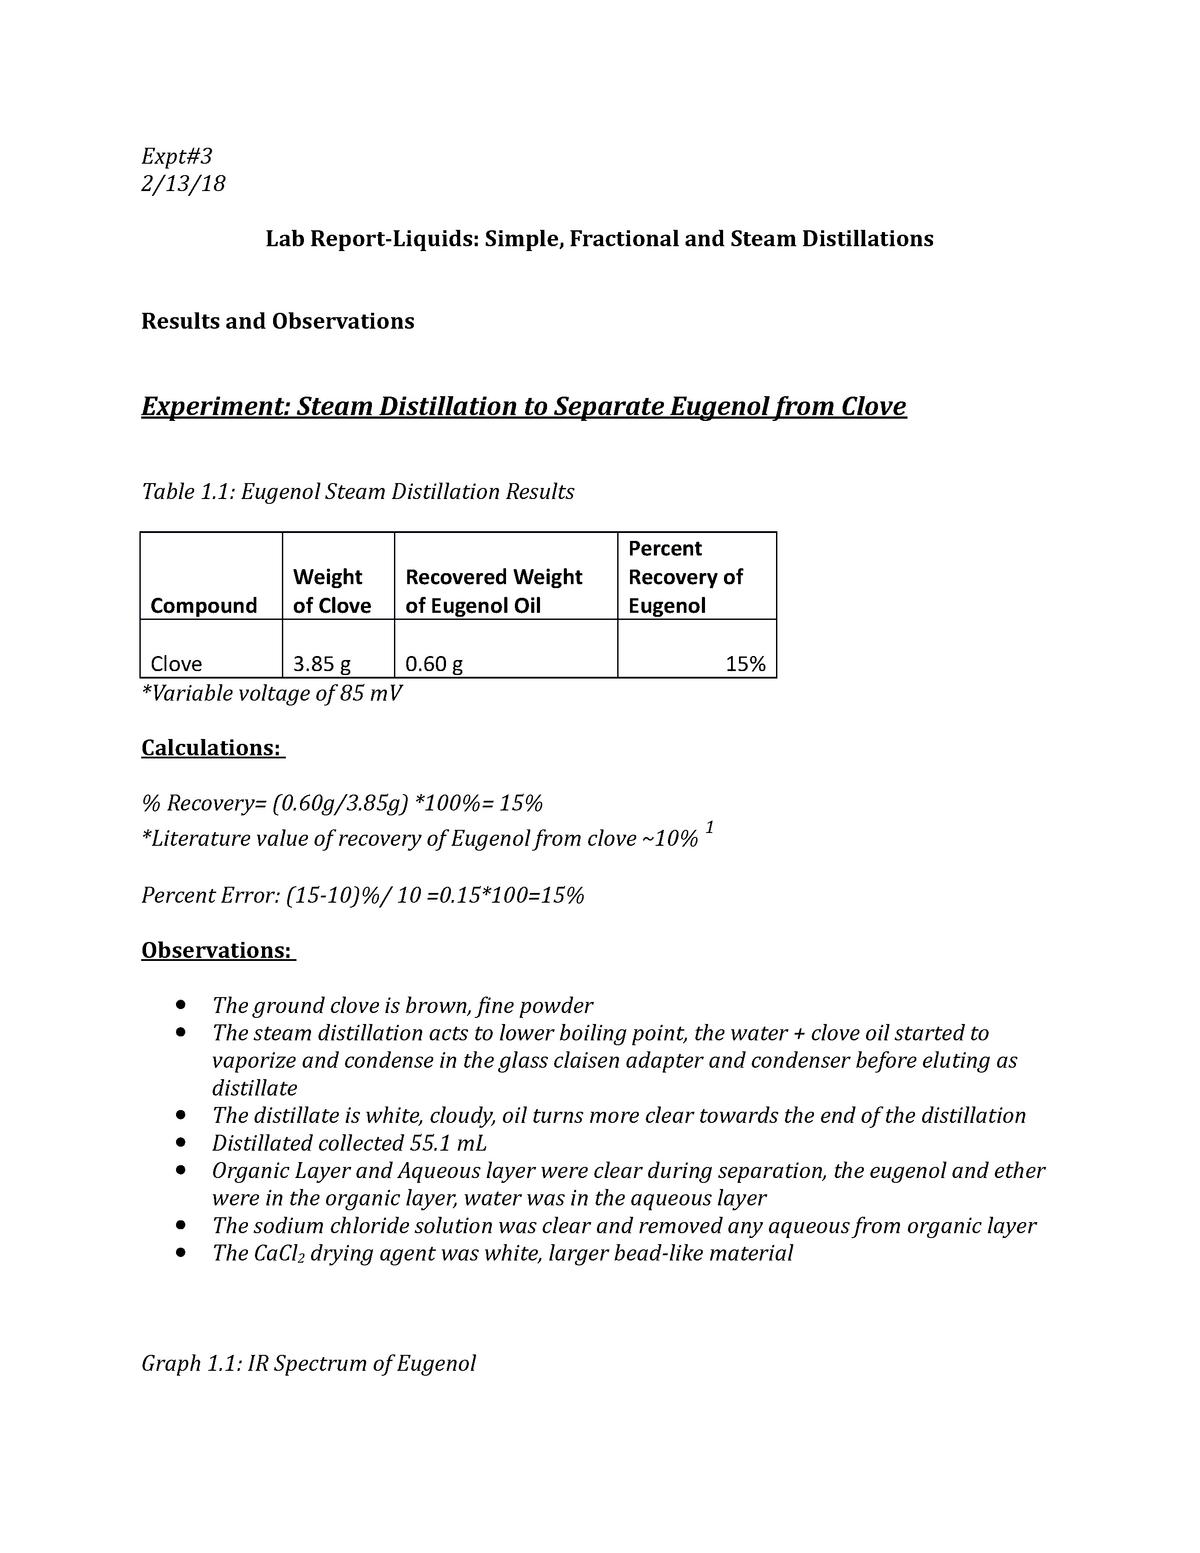 Lab Report 3-Simple, Fractional, Steam Distillation Lab - CHEM 244